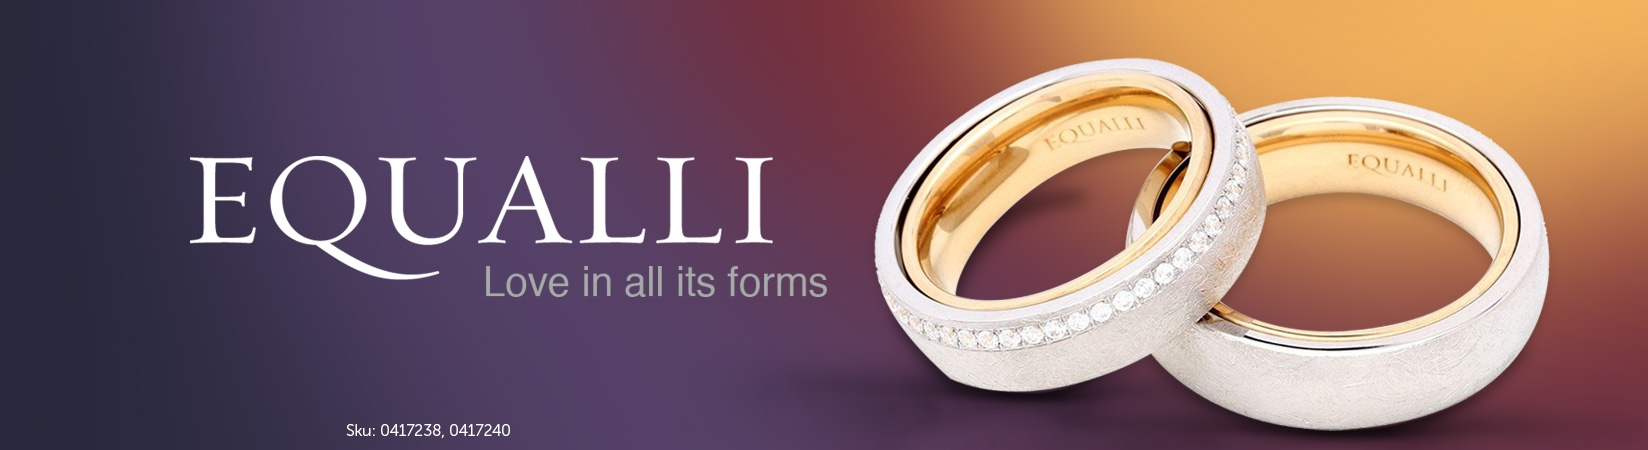 Equalli Ring